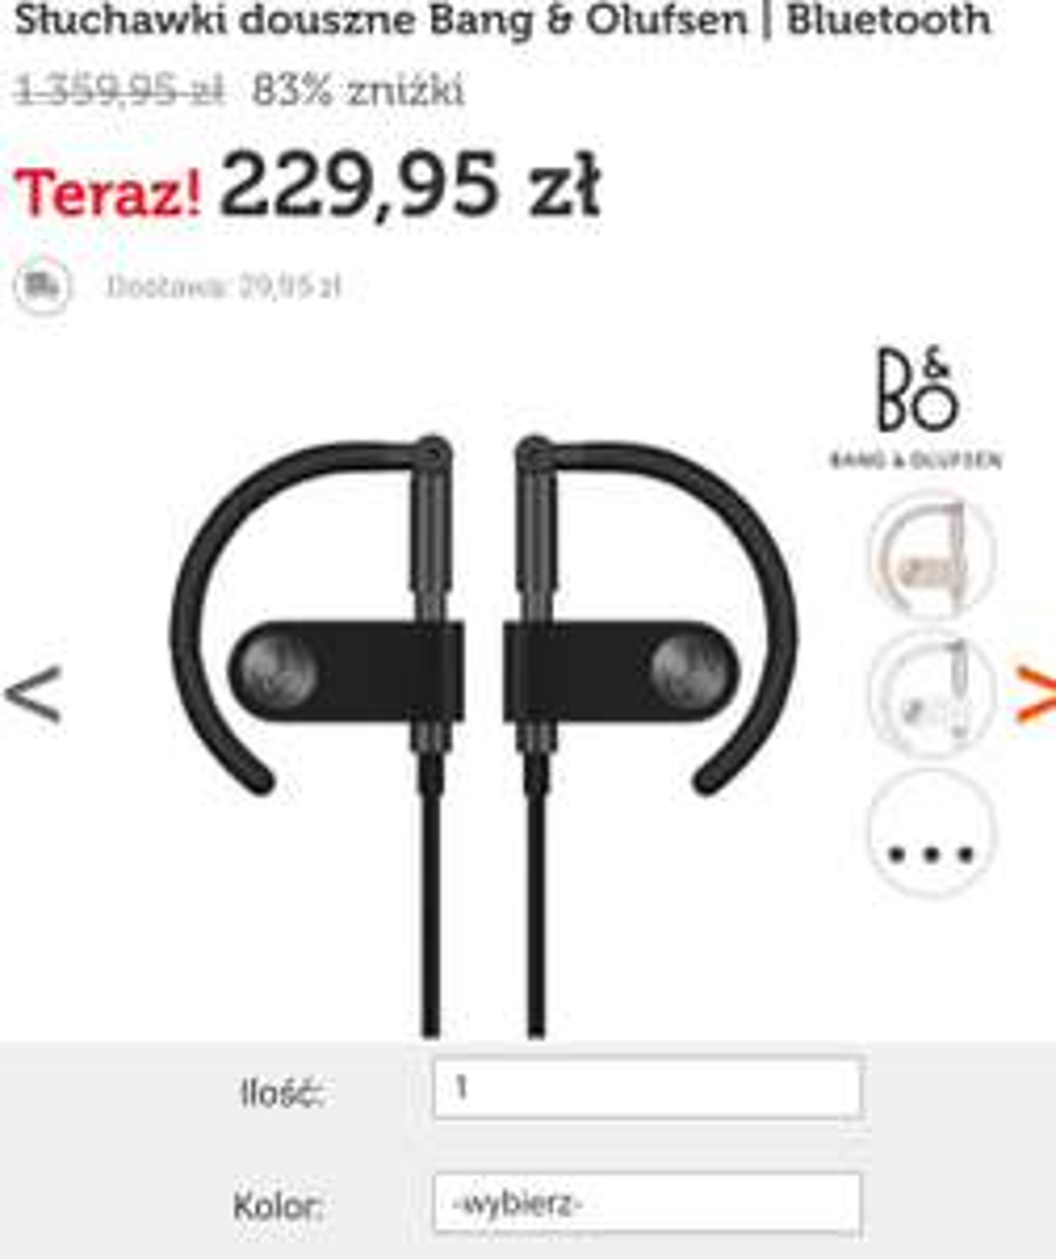 Słuchawki douszne Bang & Olufsen   Bluetooth